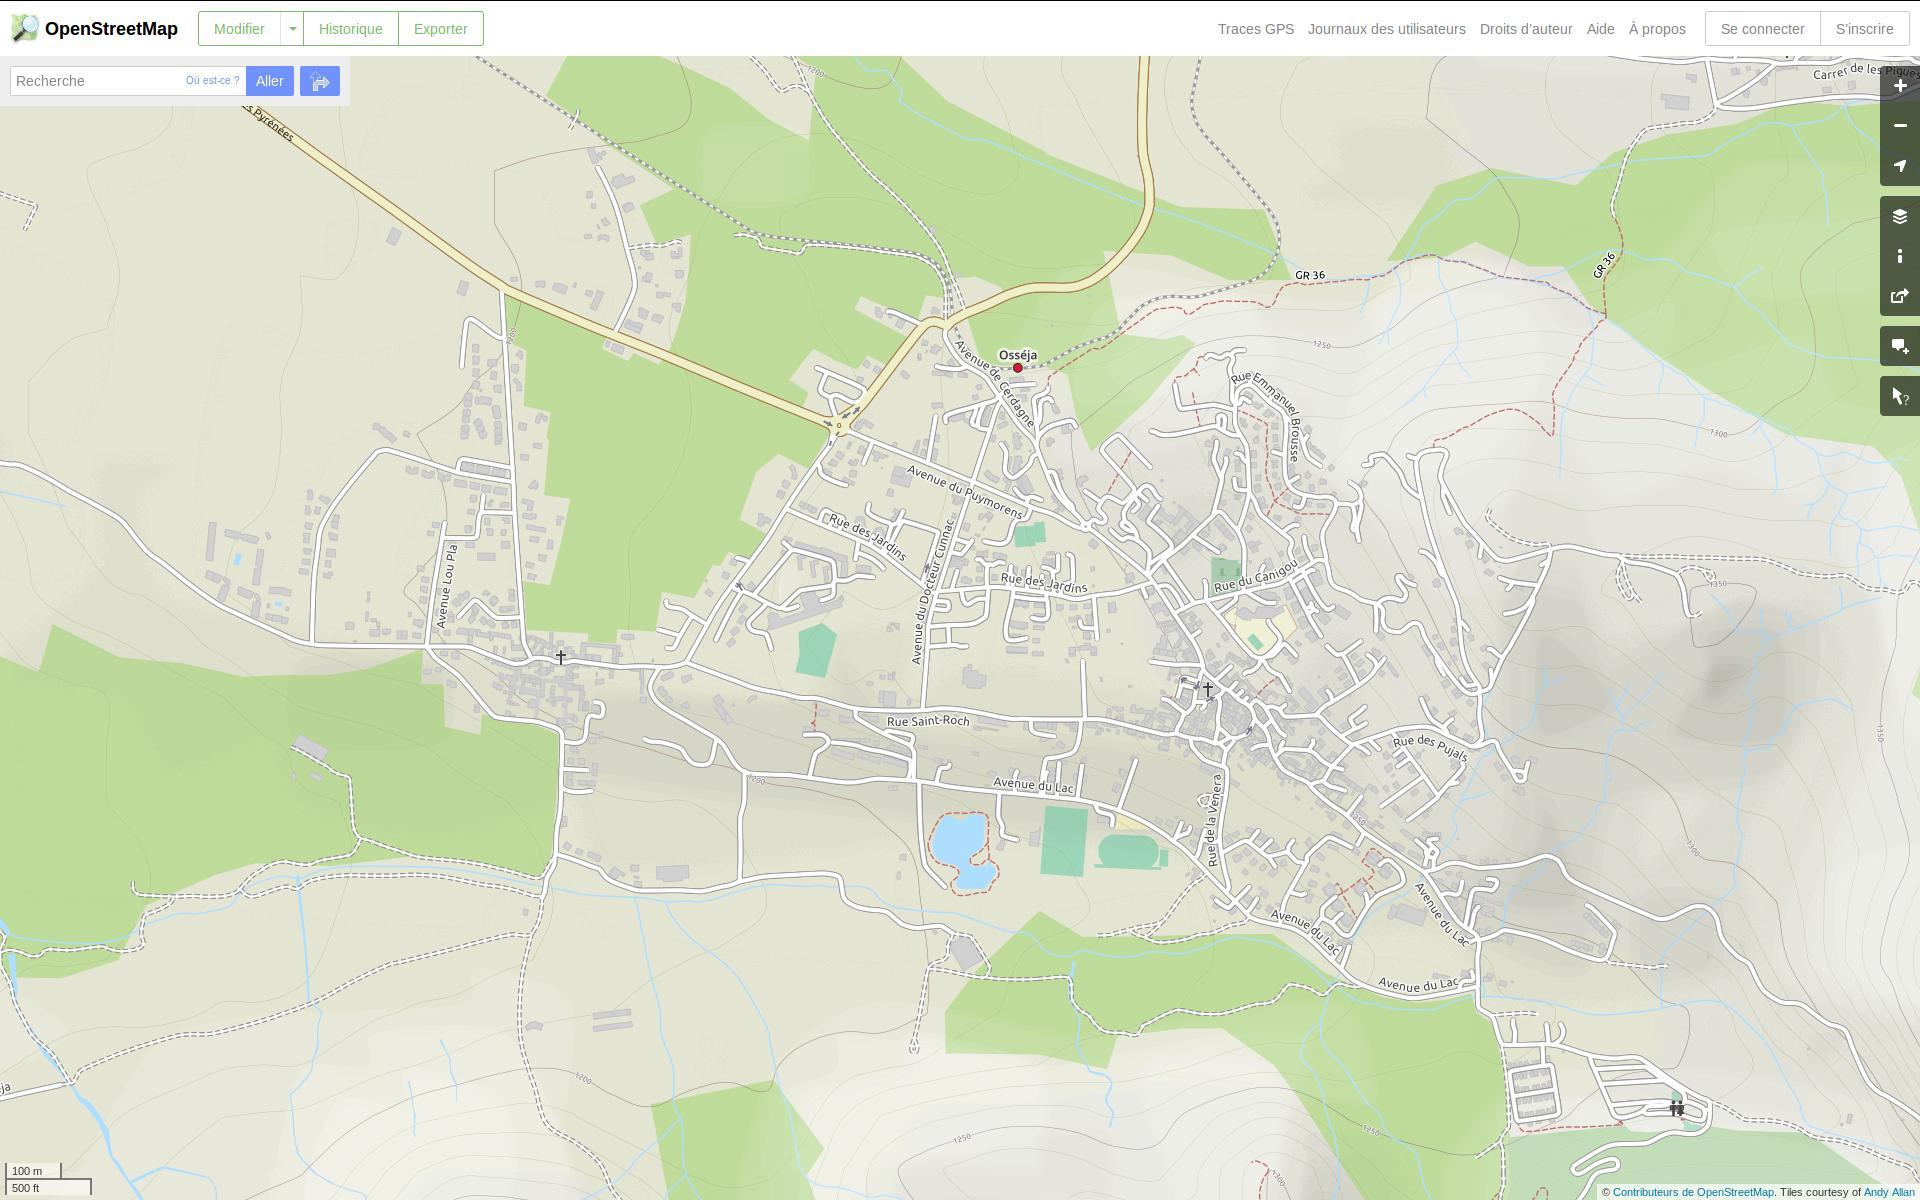 diagnostic immobilier Osséja 66340 DPE vente Osséja